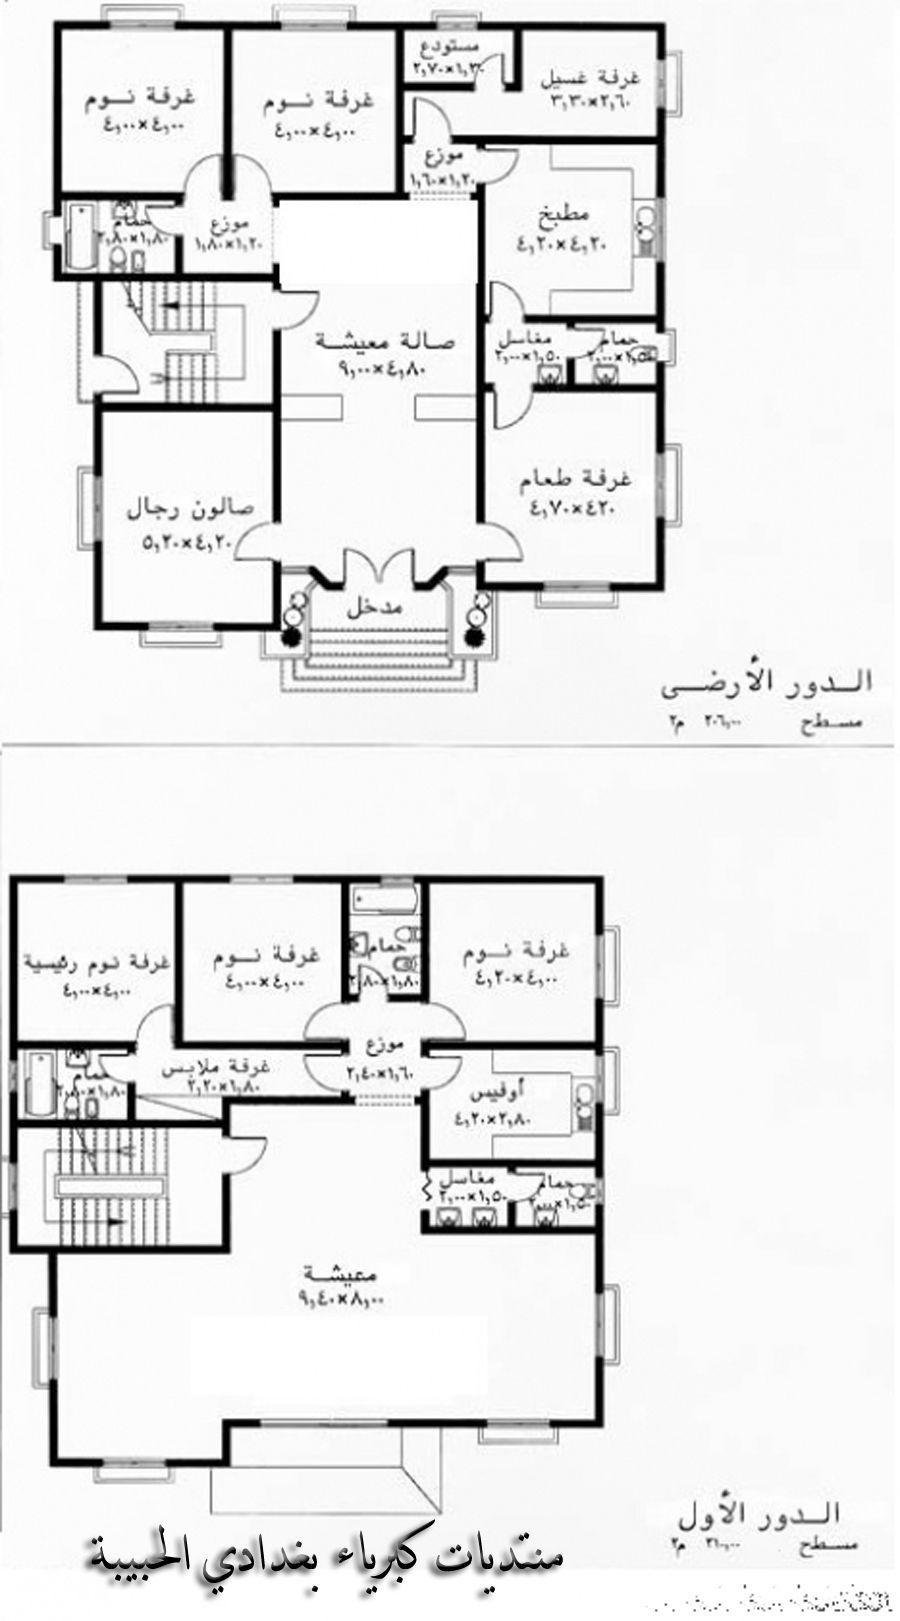 تصاميم منازل منوعة منتديات كبرياء بغدادي الحبيبة اجمل منتدى عربي Square House Plans My House Plans 2bhk House Plan